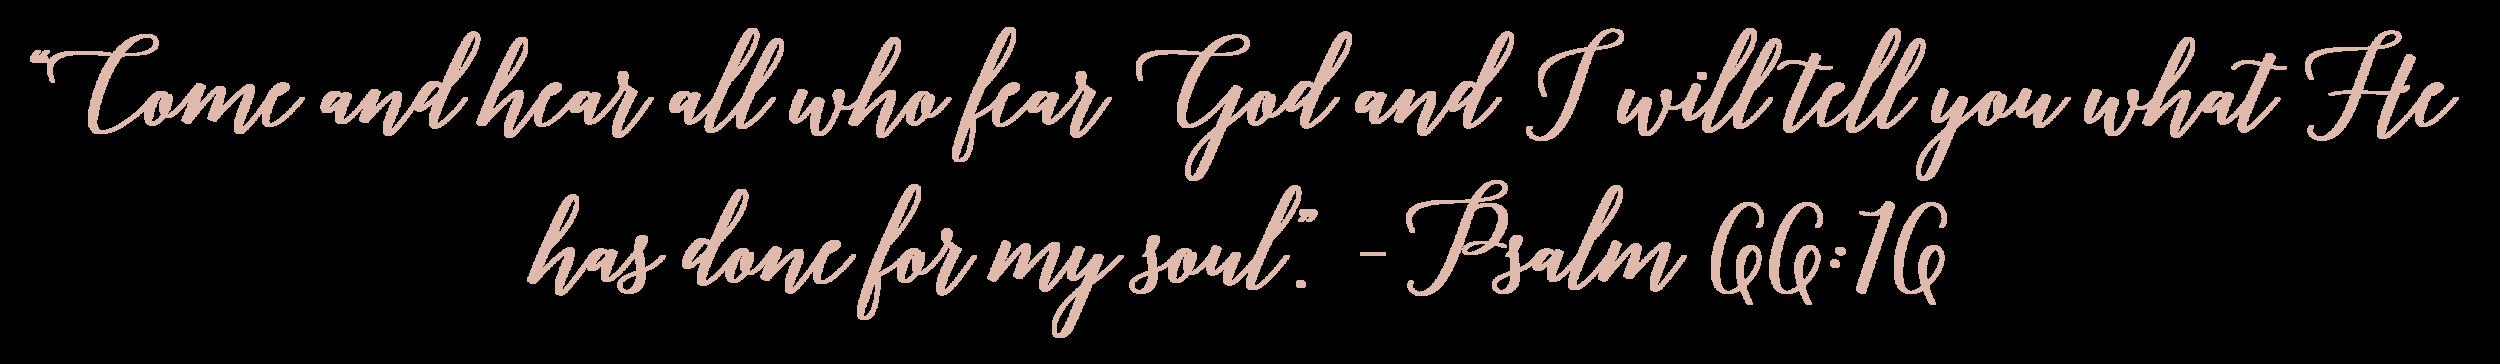 contact-scripture-01.png